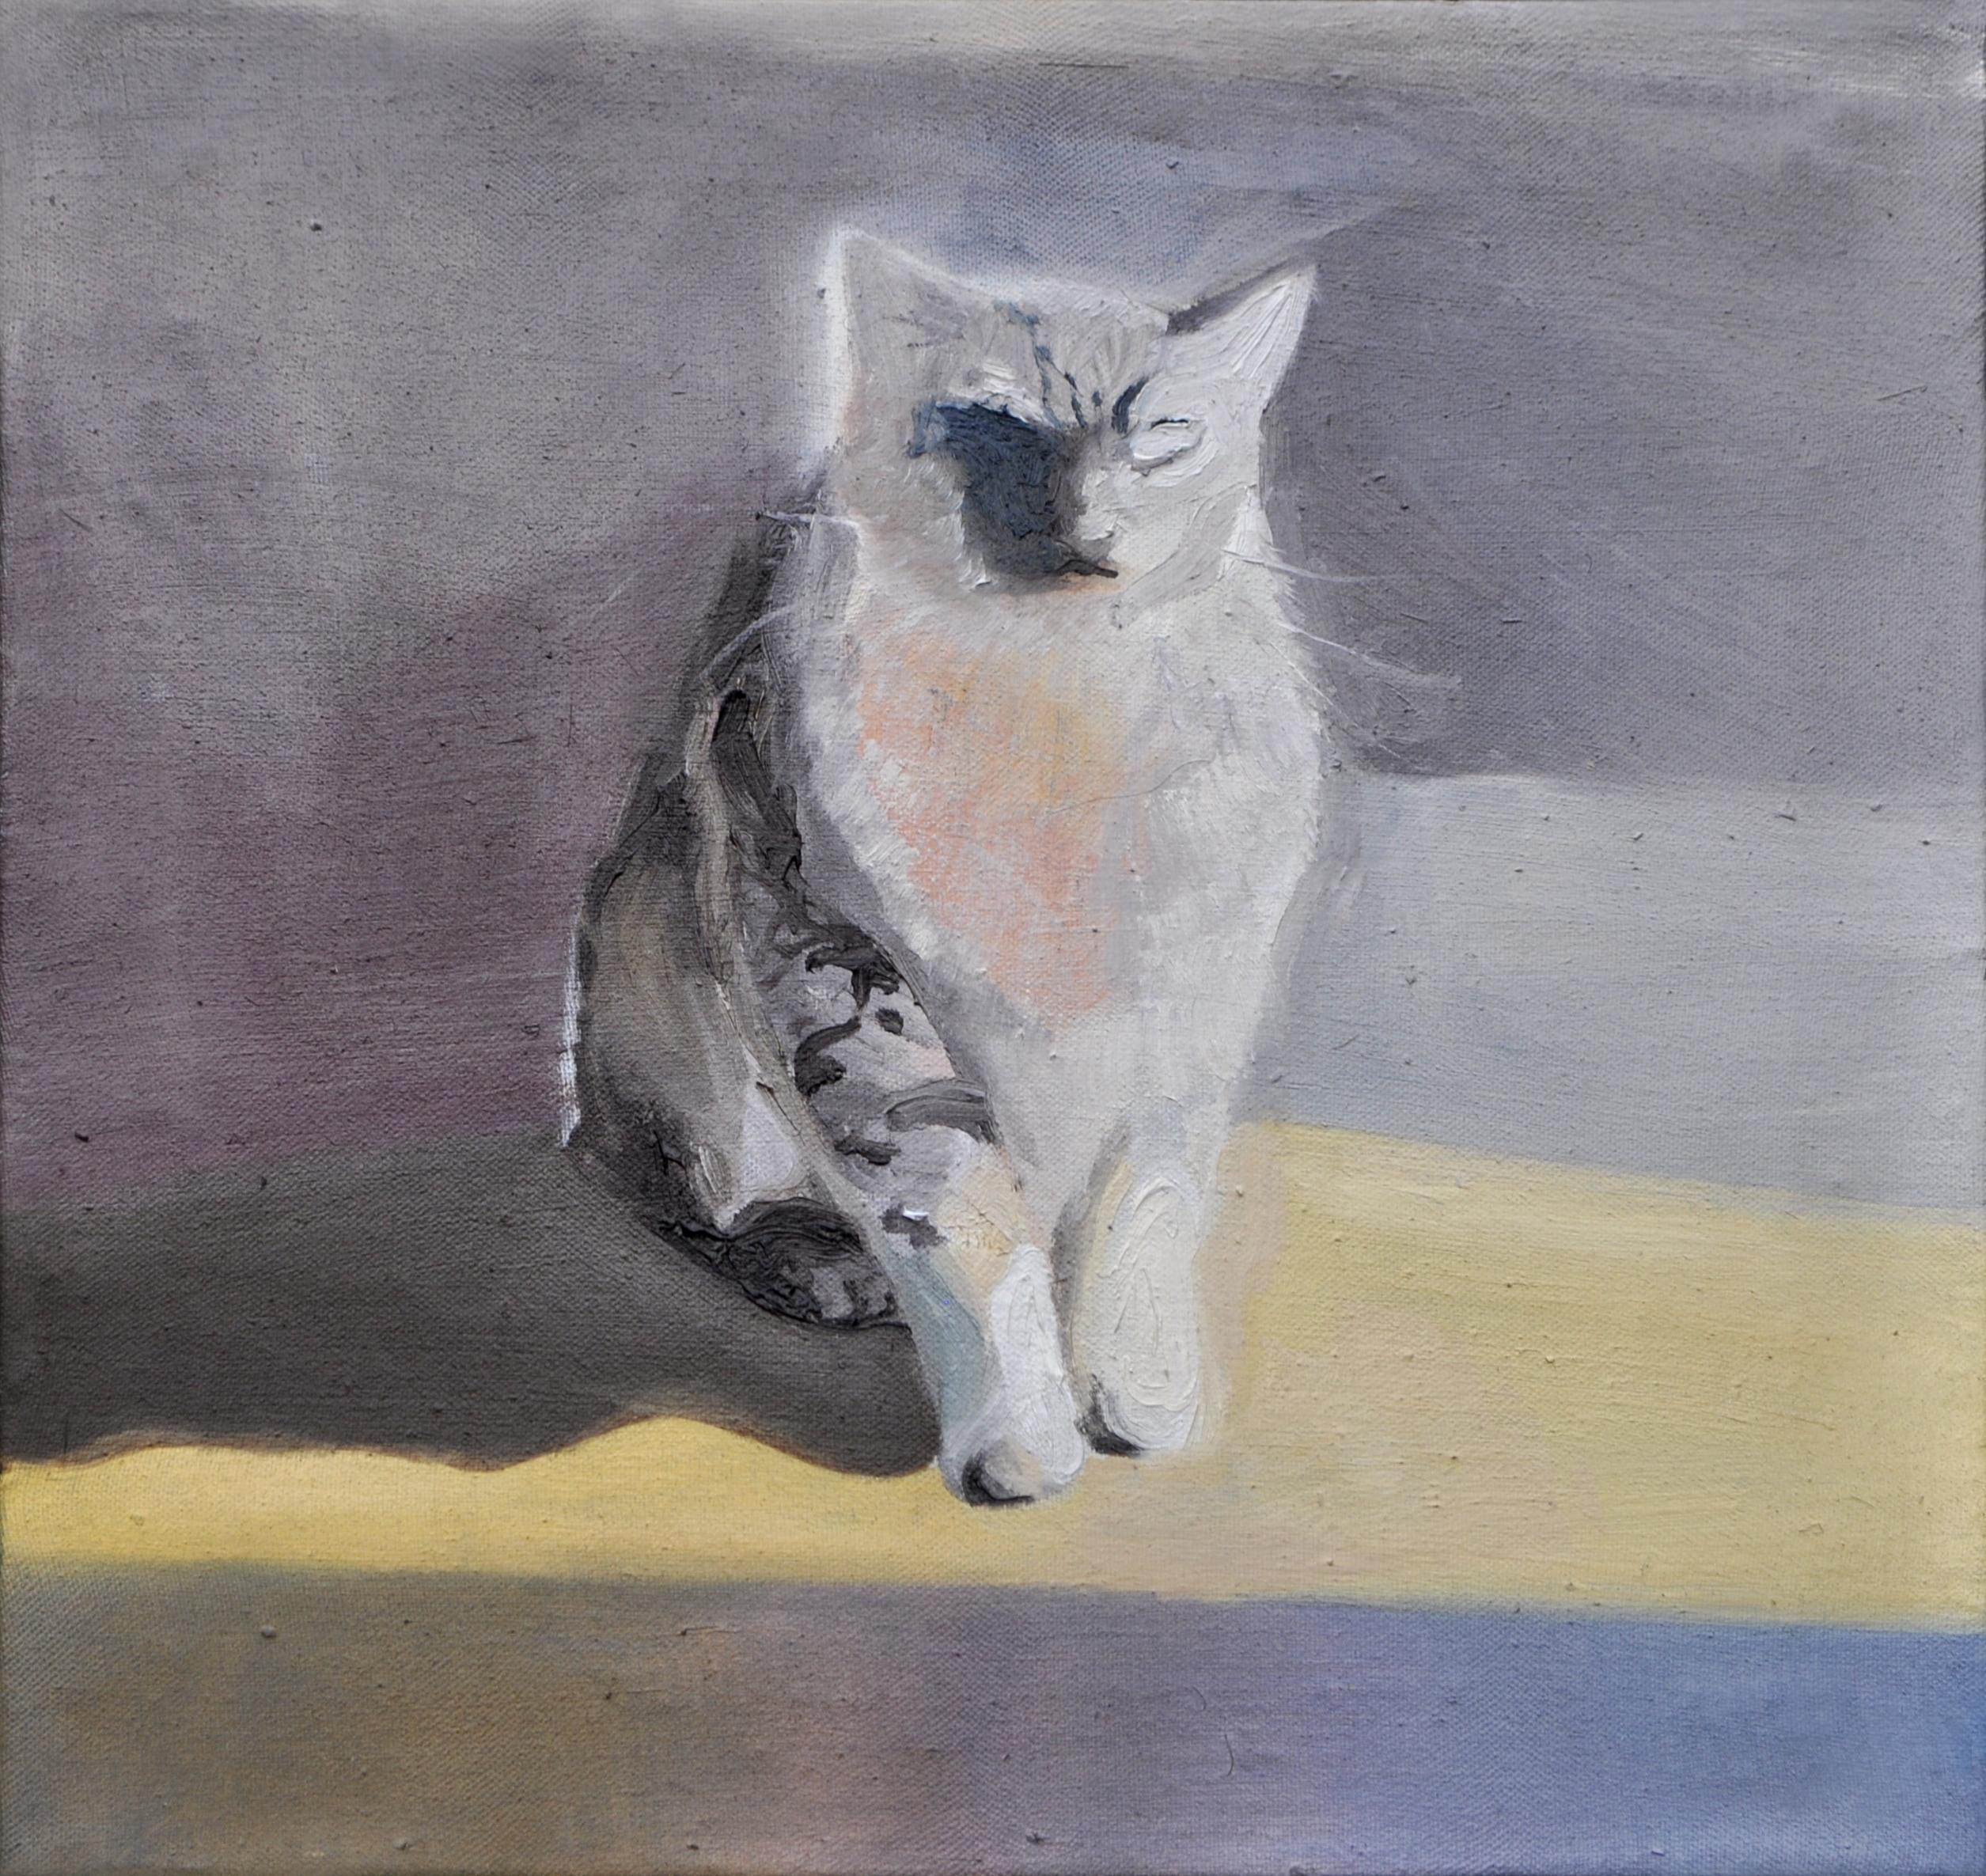 Morbido e perfido, 2017, olio su tela, 4